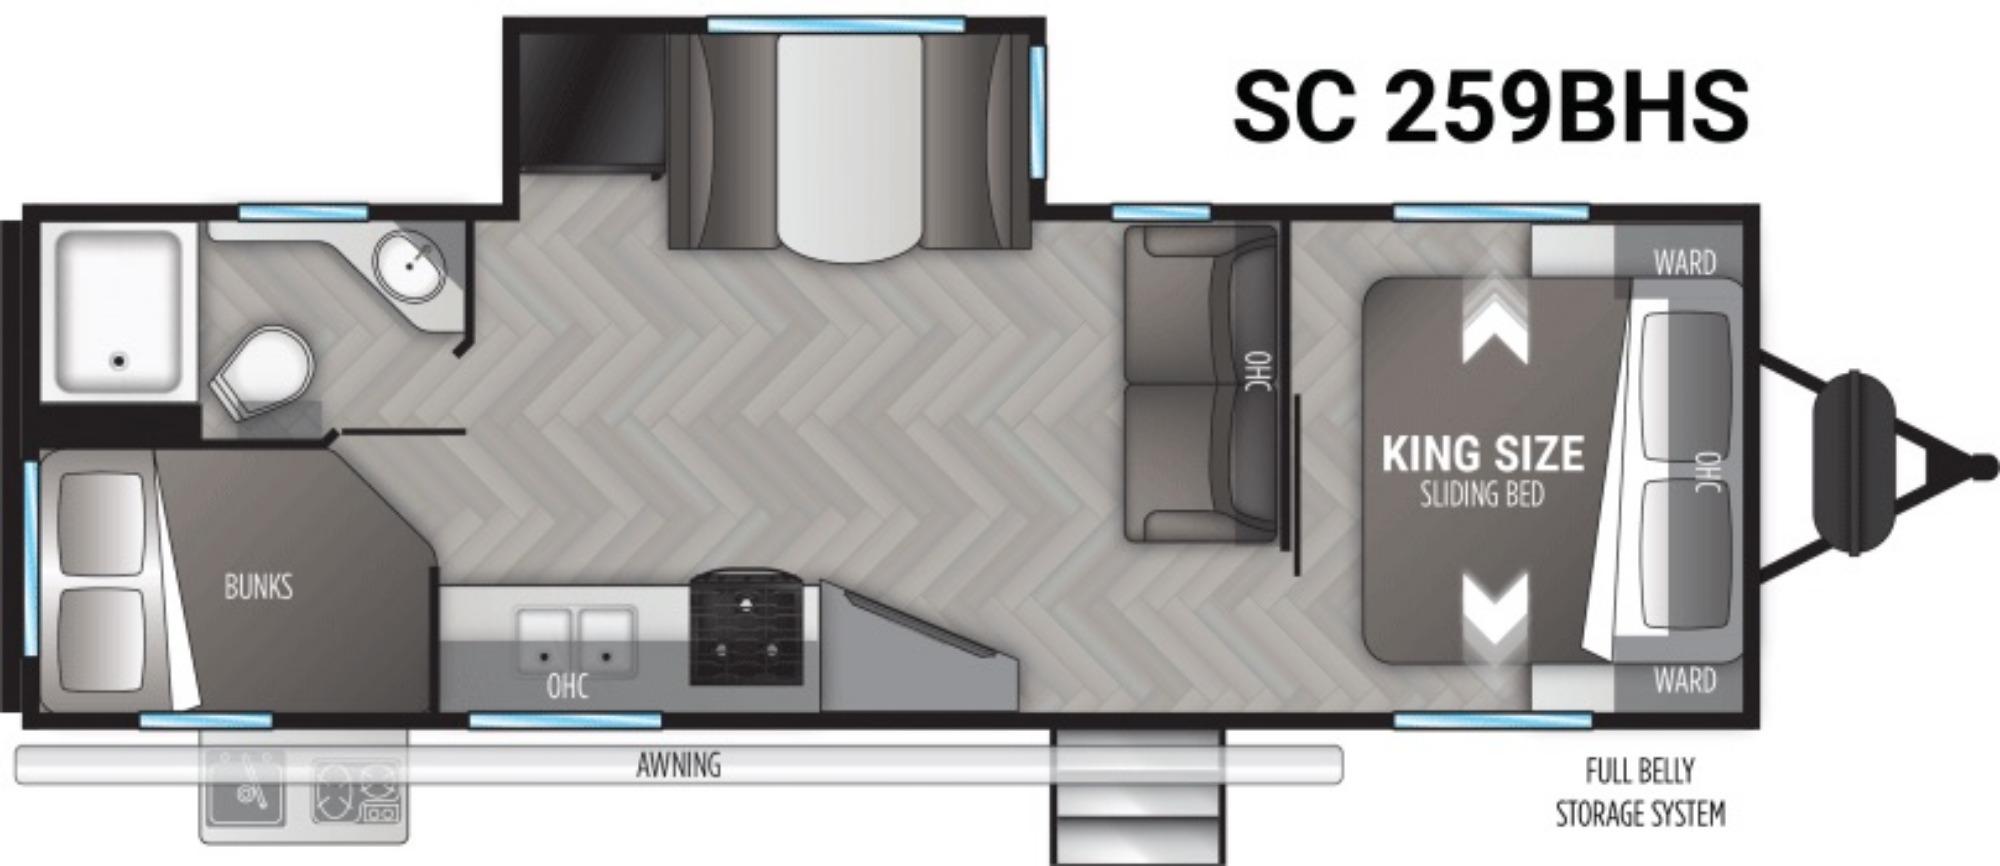 2021 Cruiser RV id259bhs